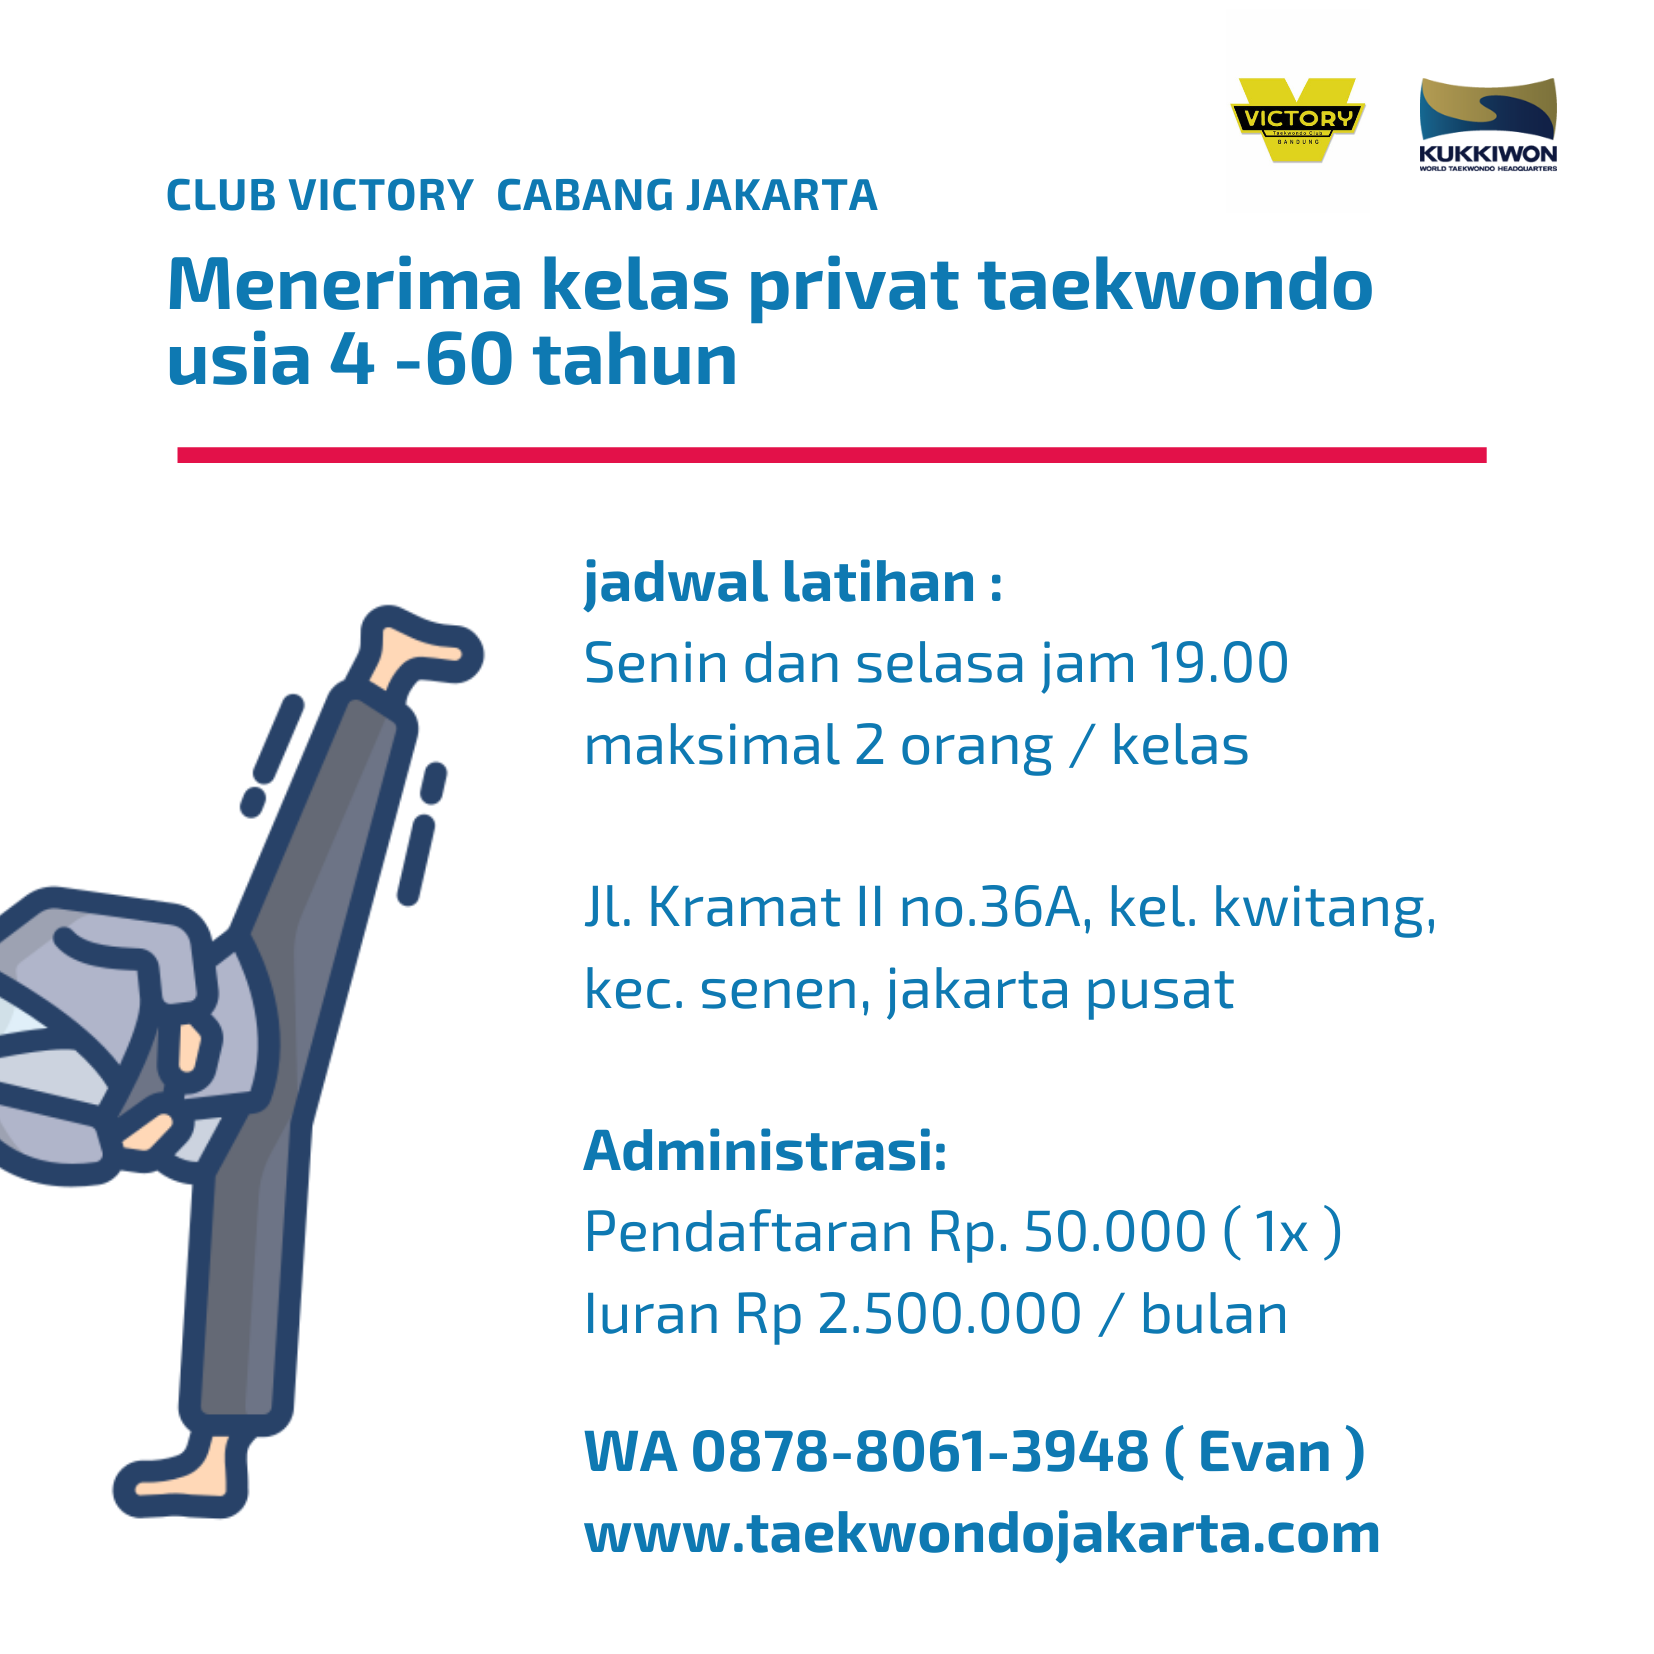 Taekwondo jakarta kelas privat